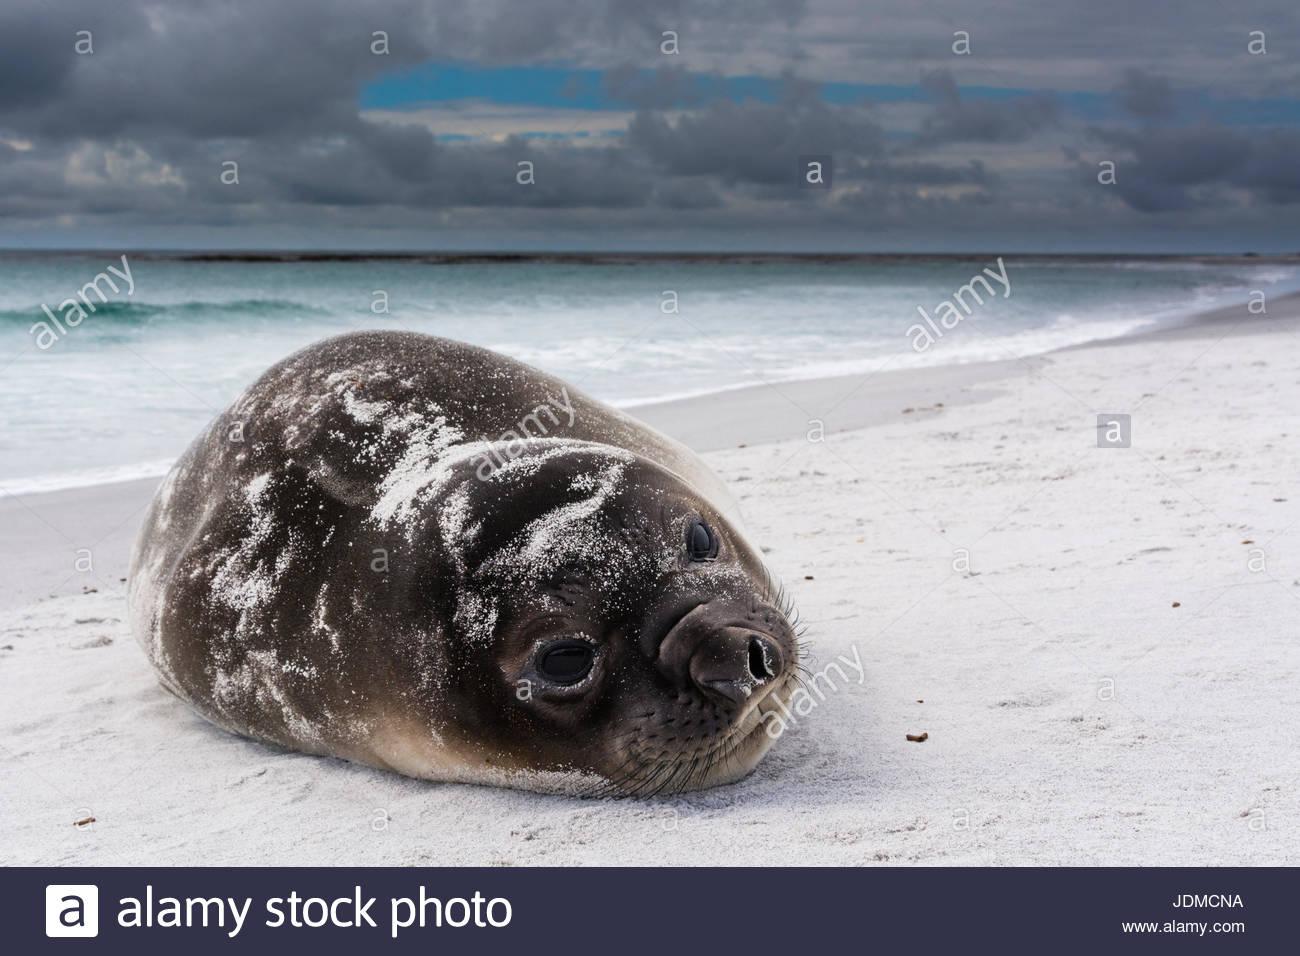 Southern elephant seal pup, Mirounga leonina, resting on a beach. - Stock Image